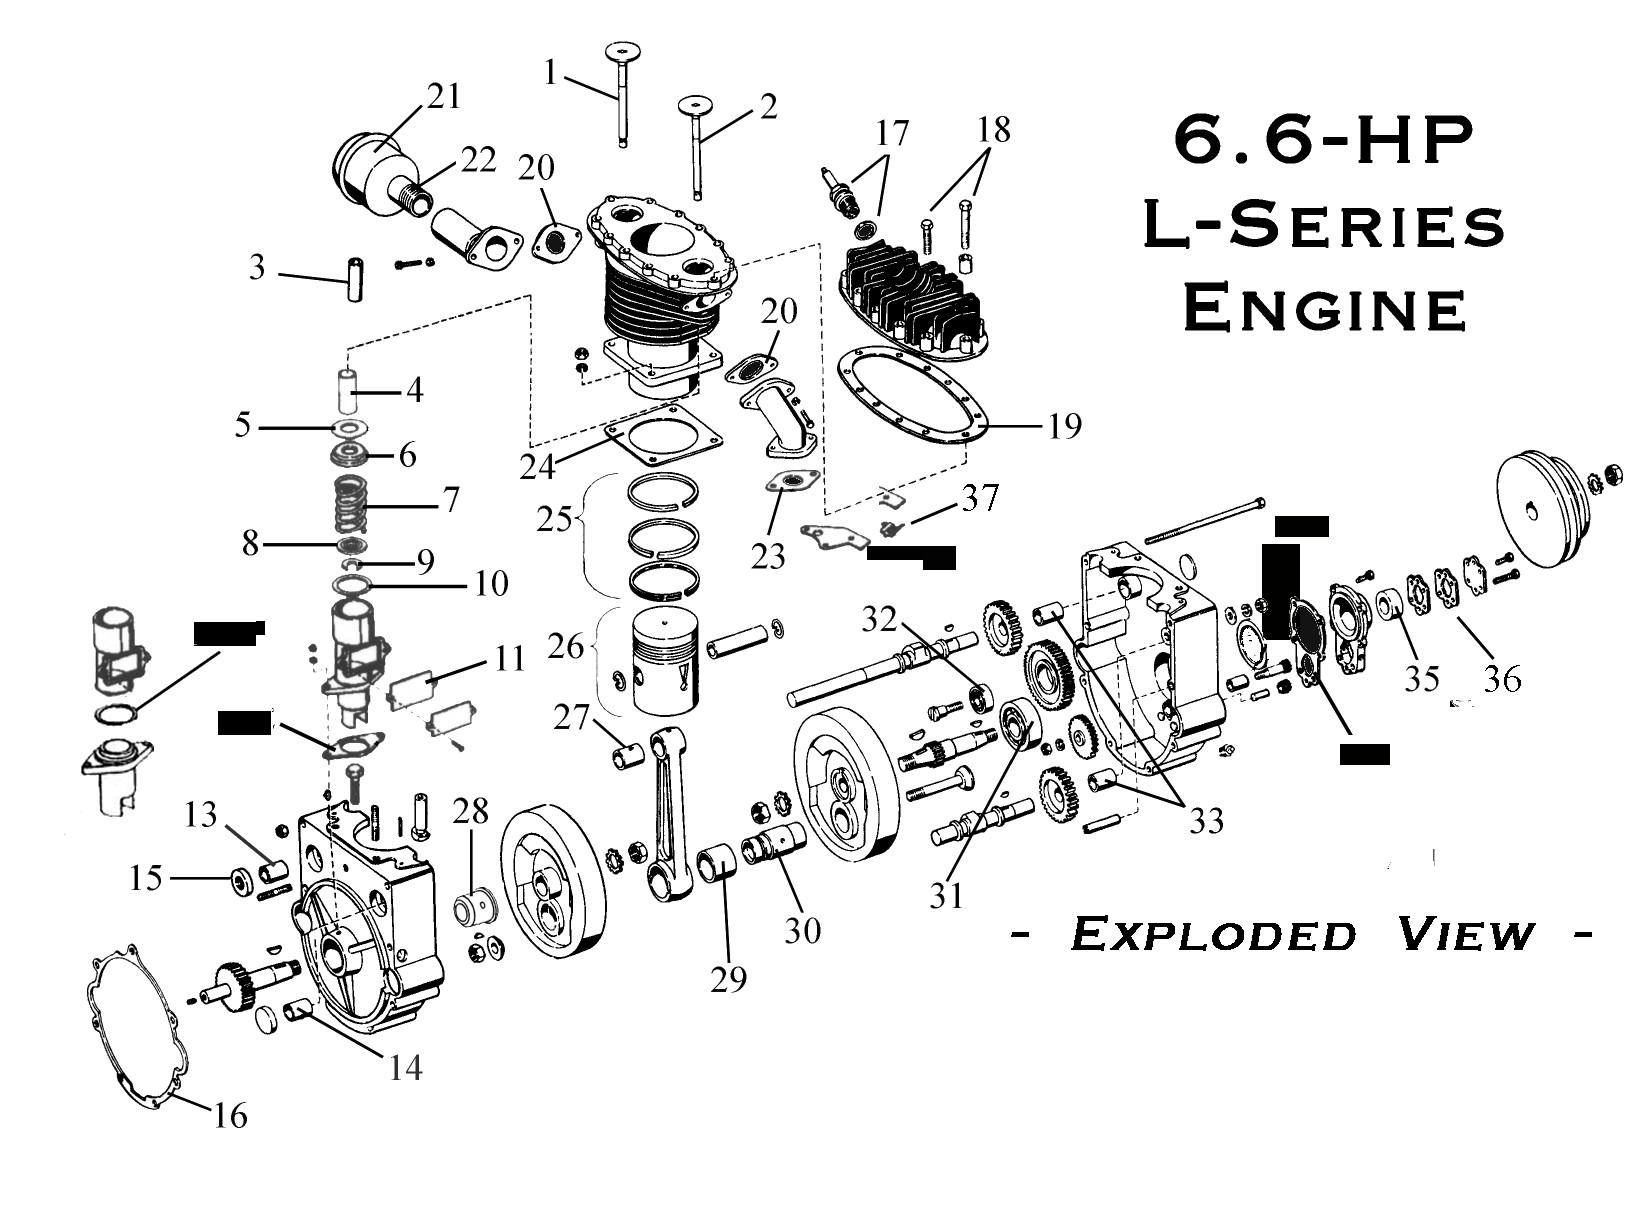 Engine Valve Parts Diagram 6 6 Hp Gravely Engine Parts Page Of Engine Valve Parts Diagram